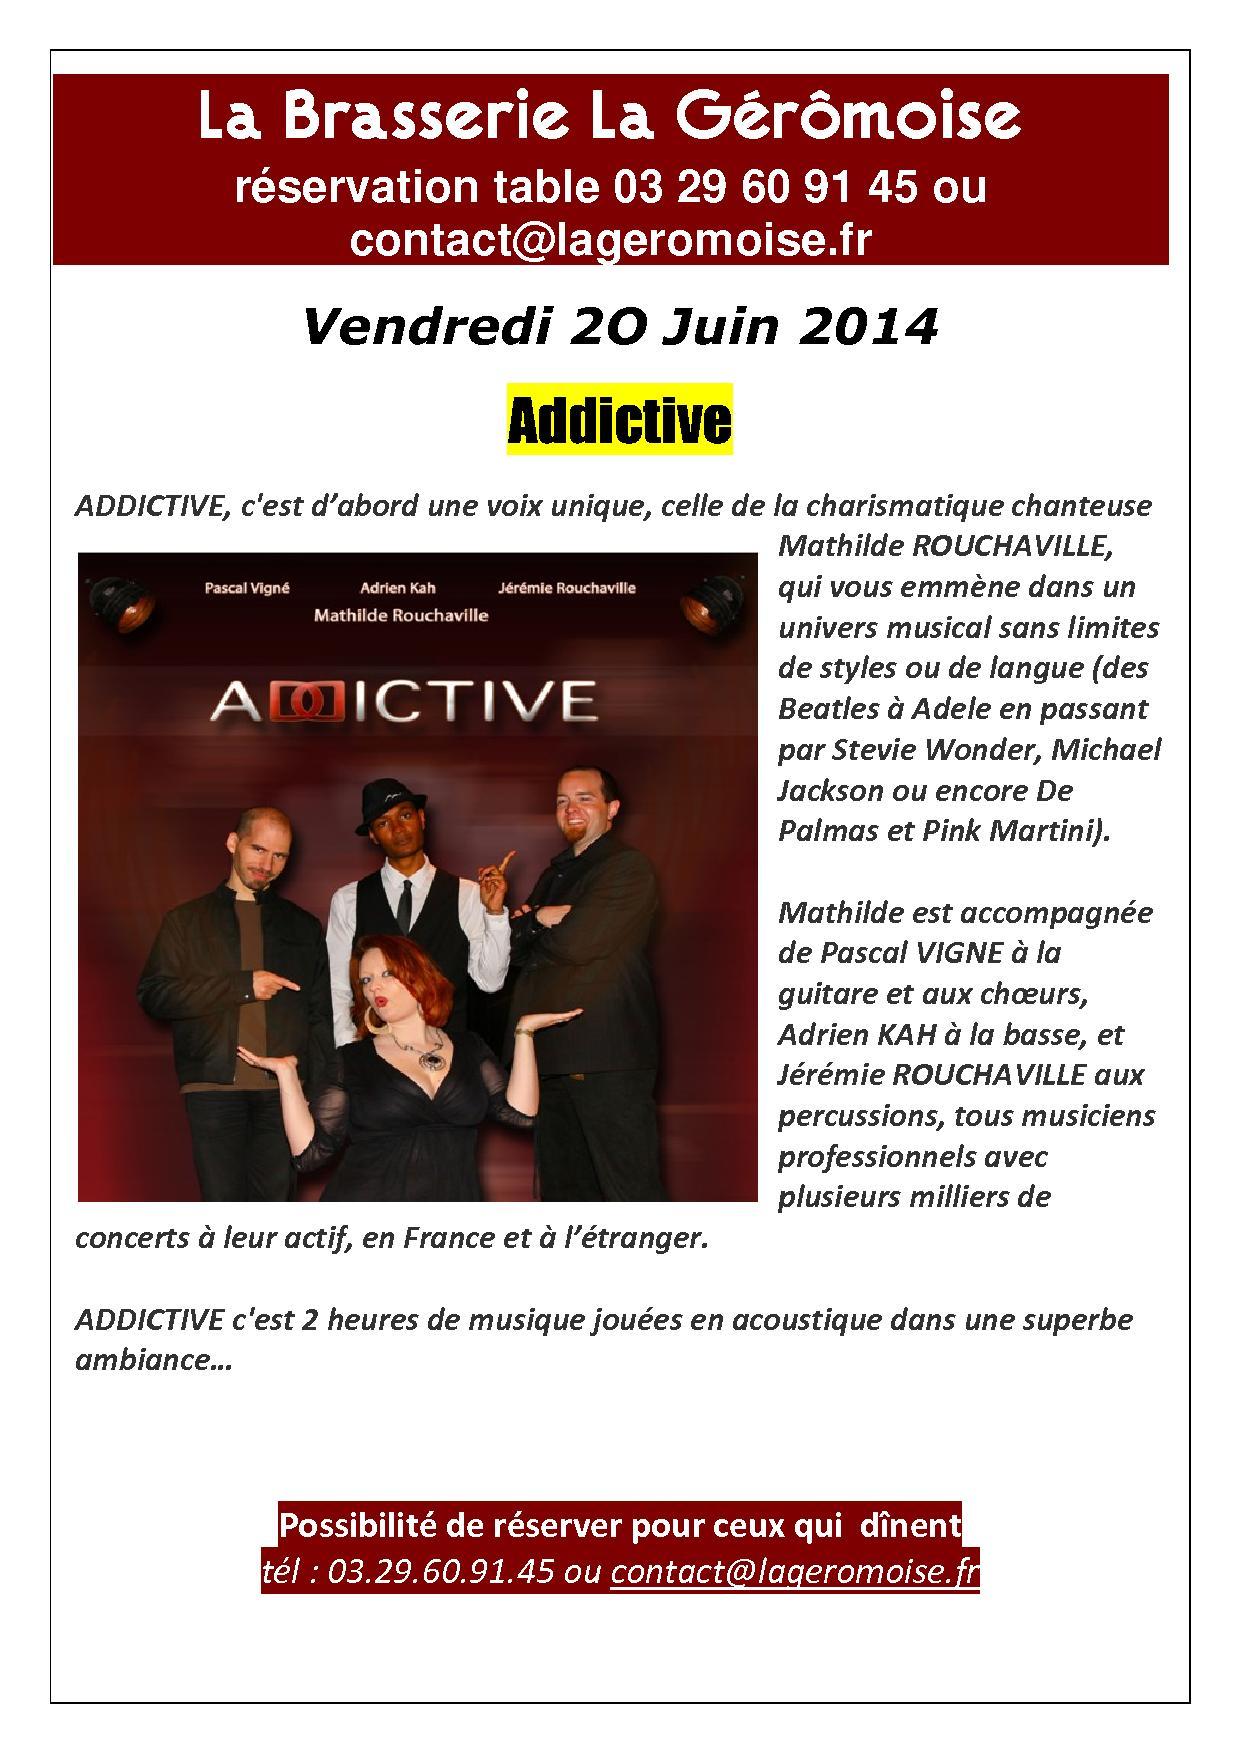 concerts-20-juin-2014-addictive.jpg